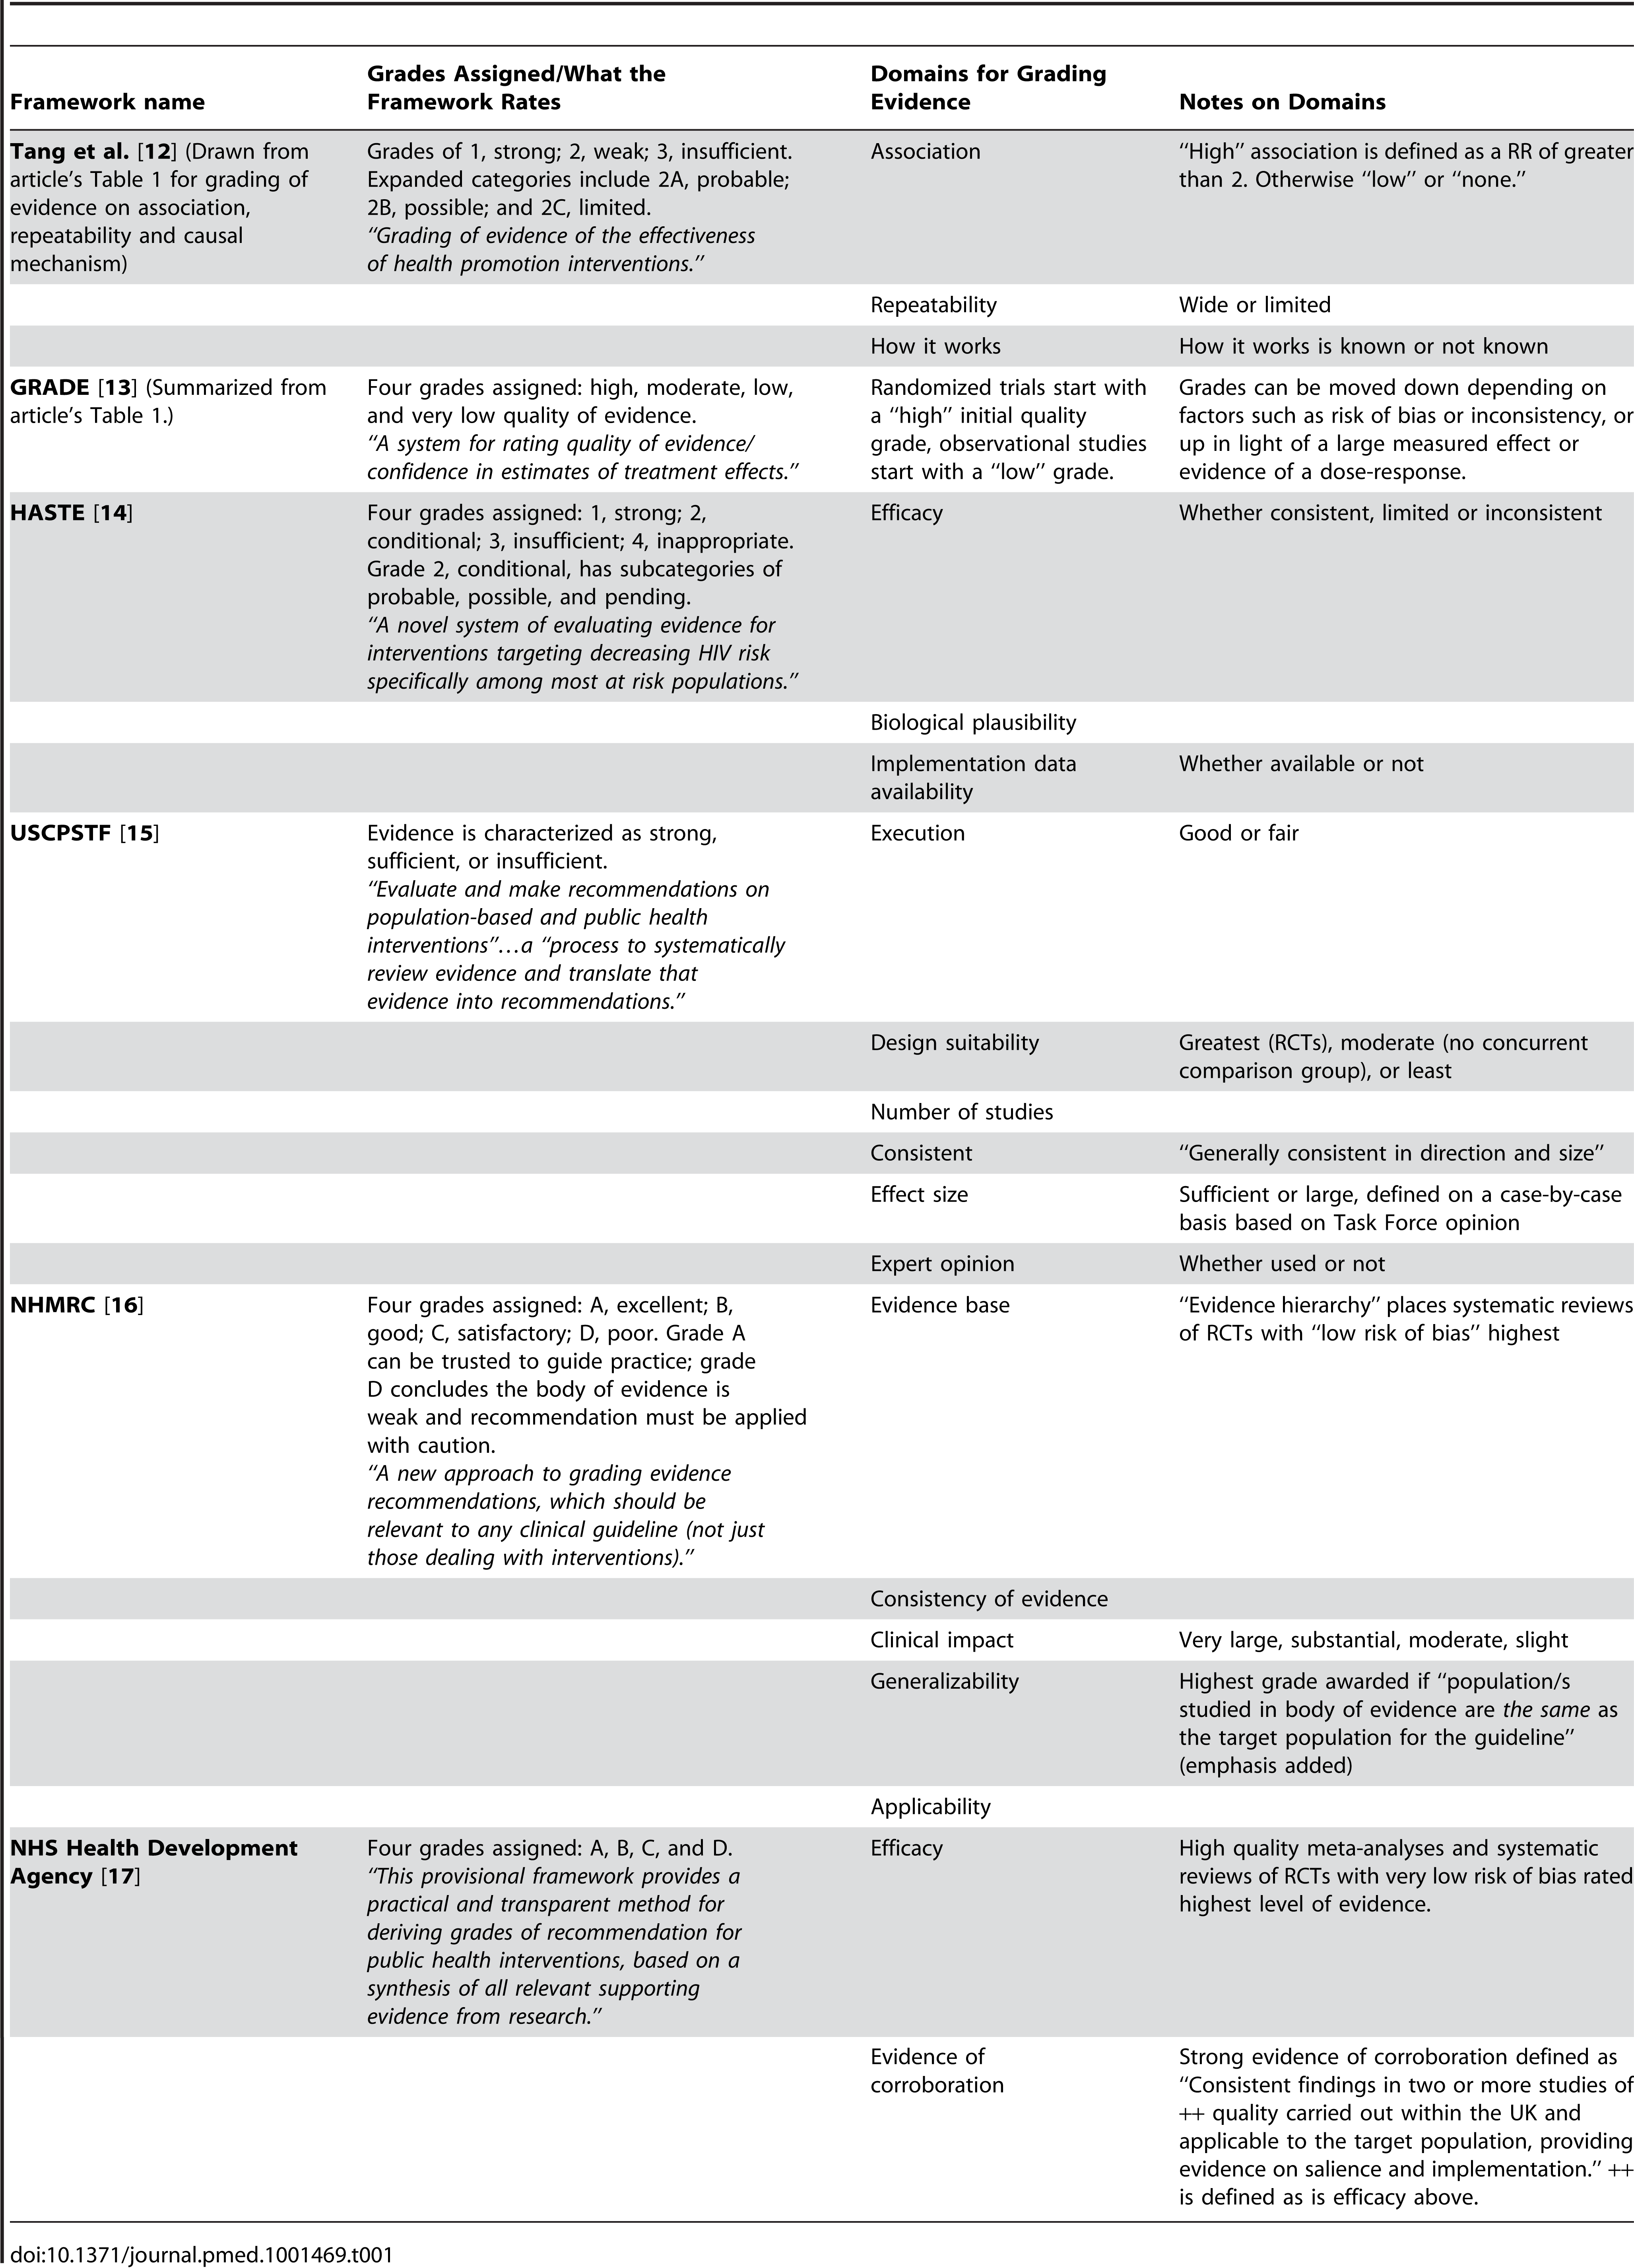 Summary of existing public health frameworks considered.